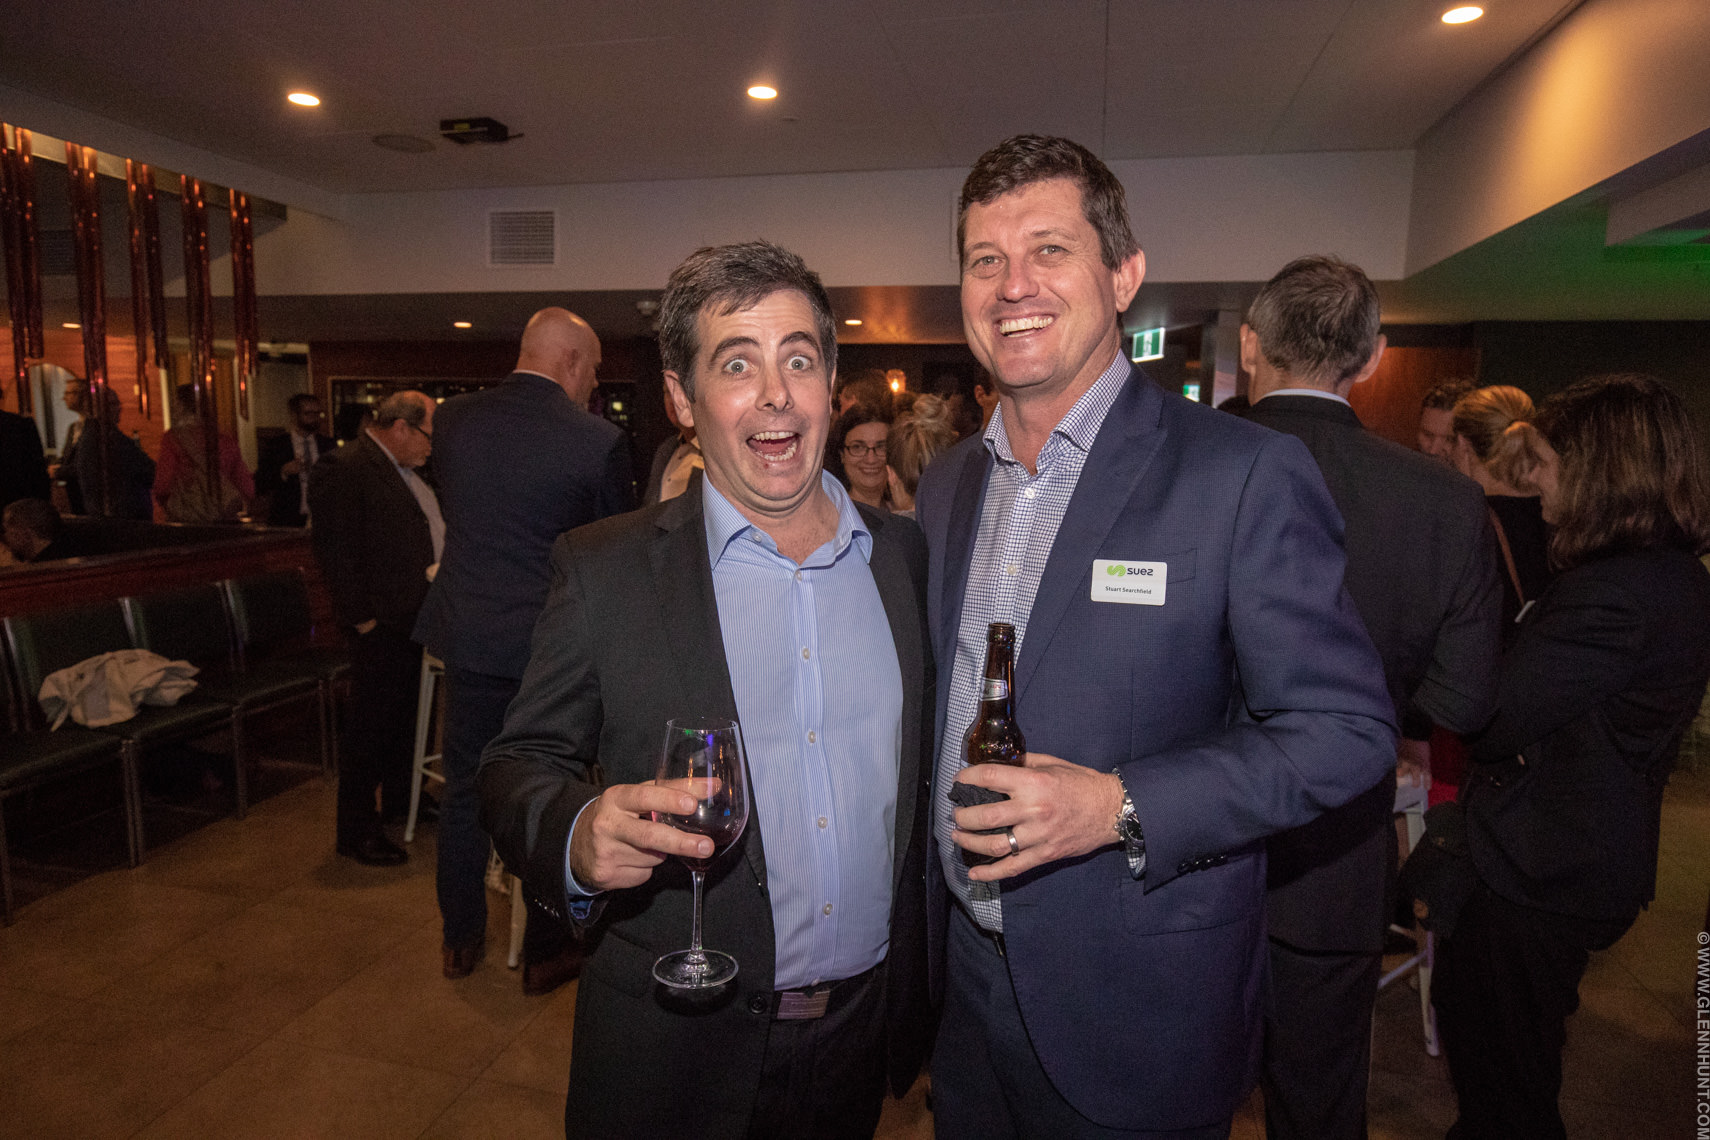 Australian Corporate Event Photographer